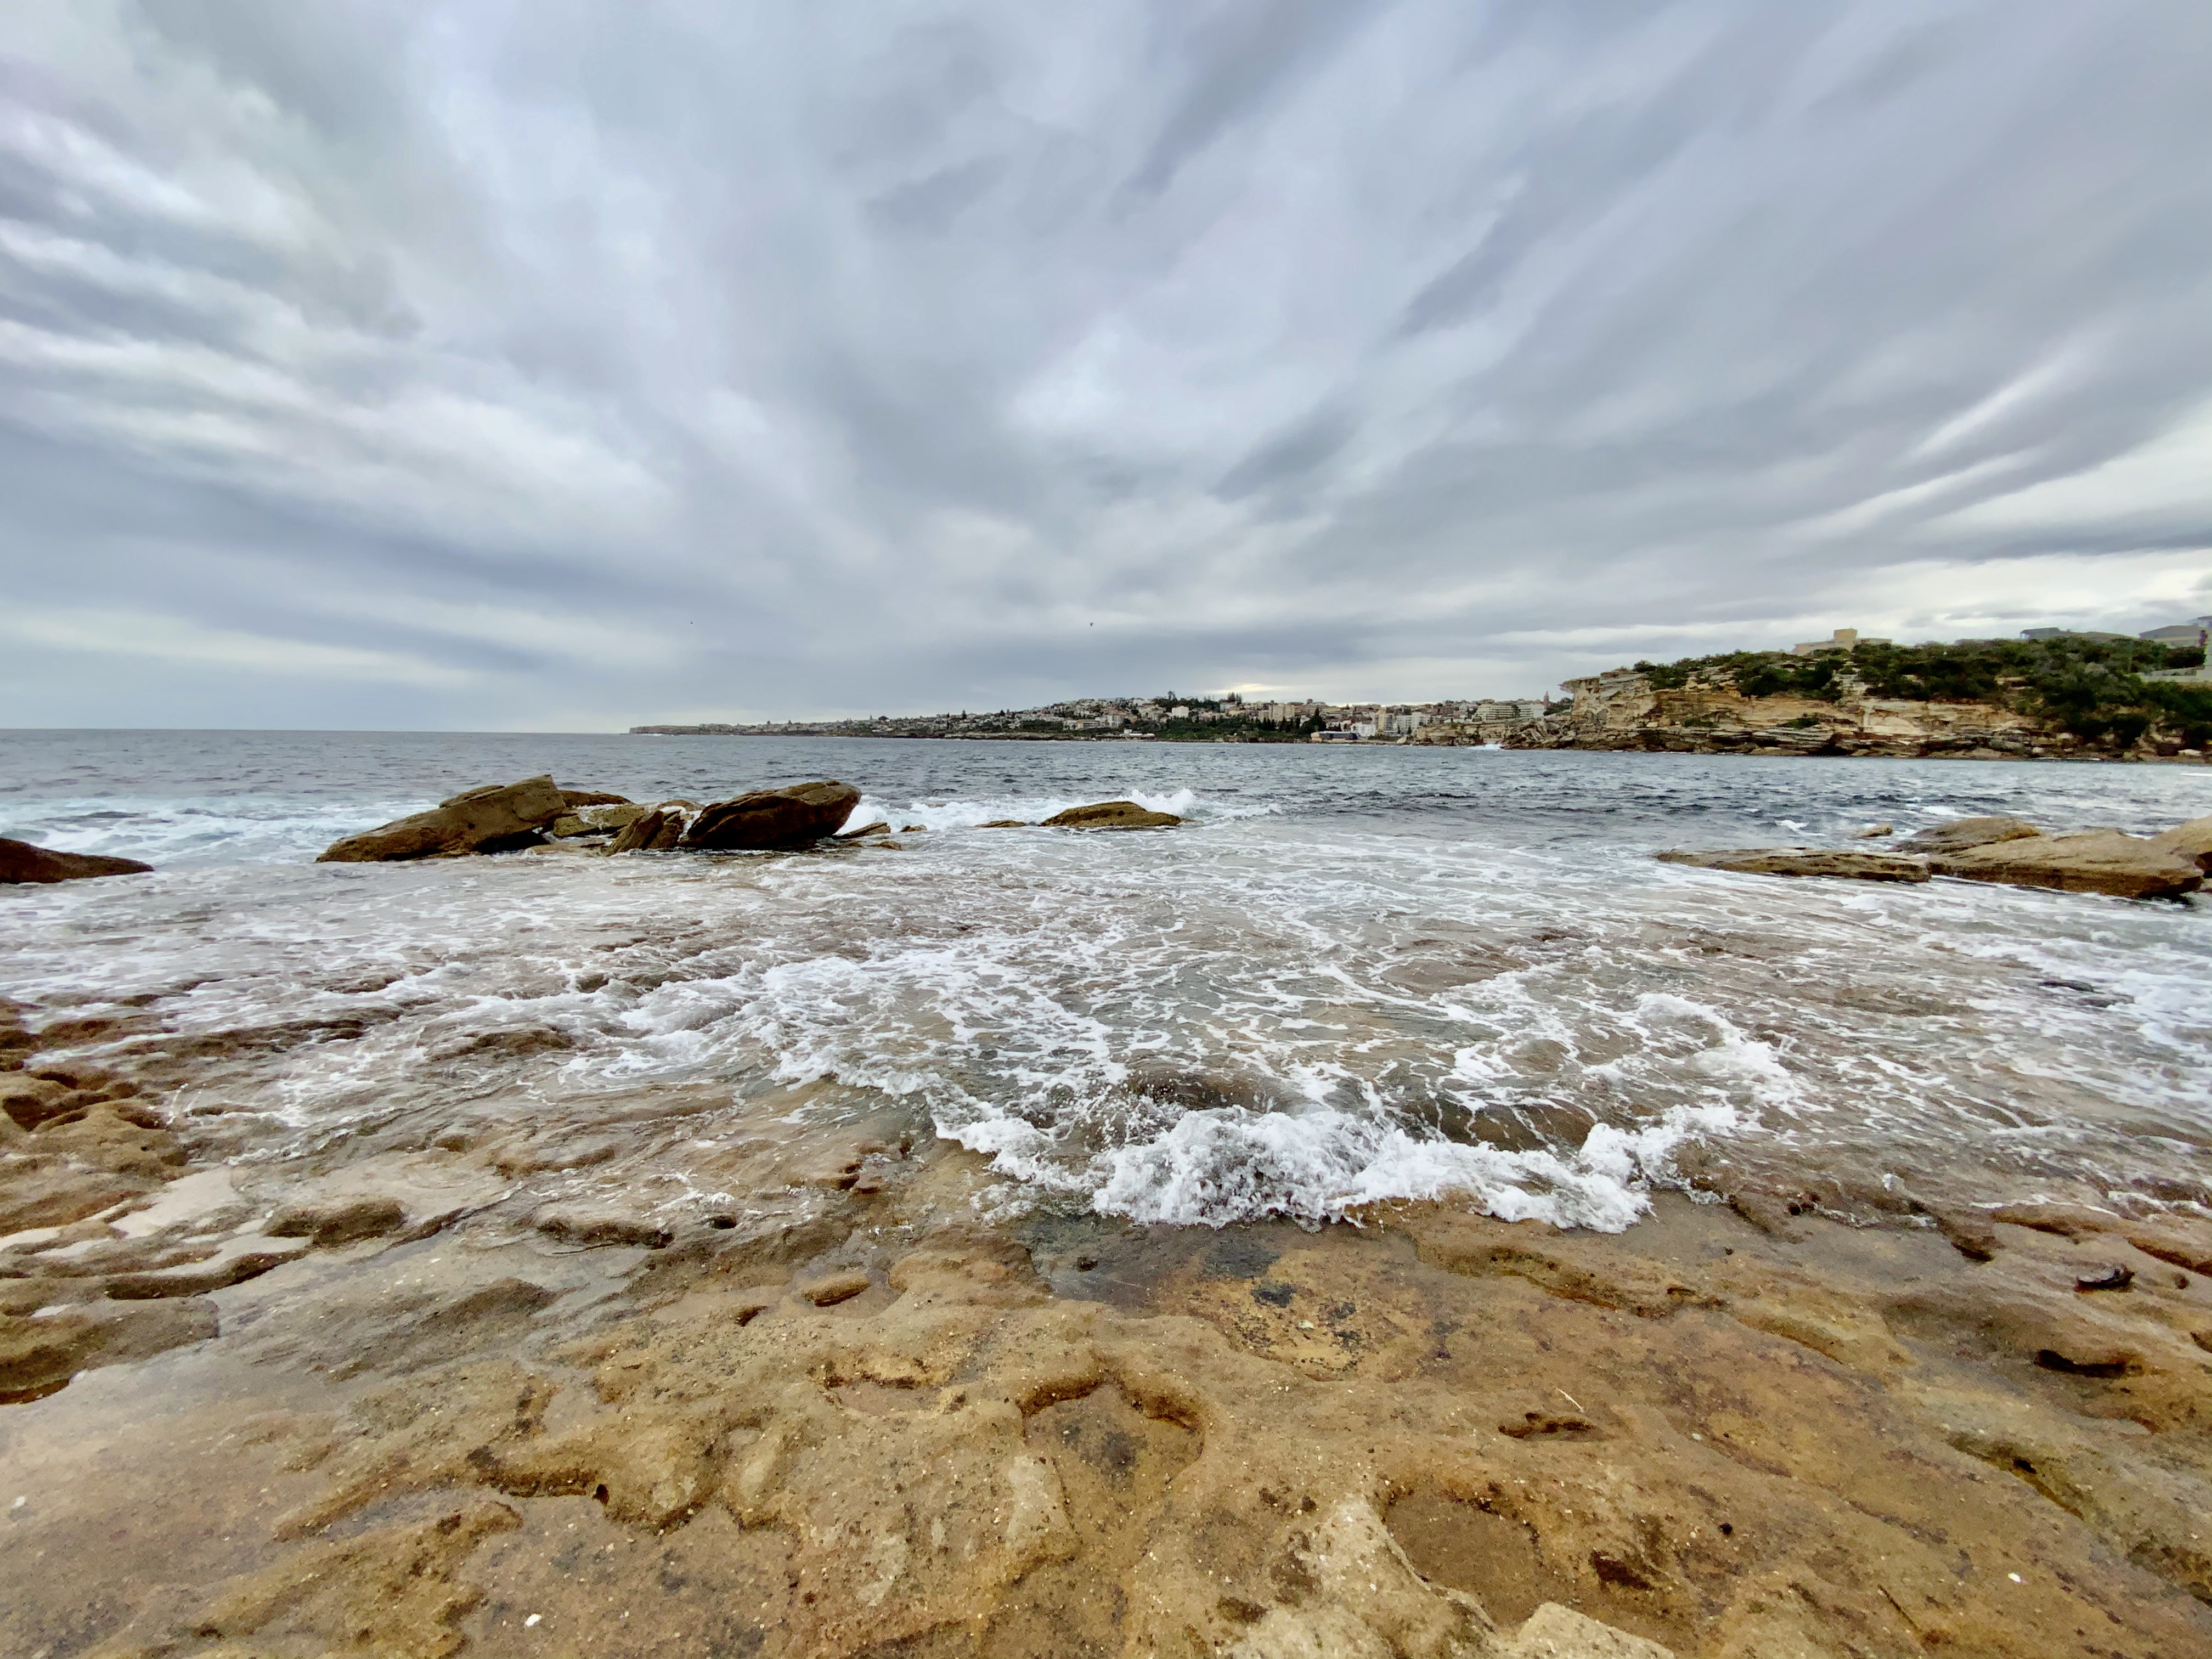 Phone photography - Sydney Coogee beach